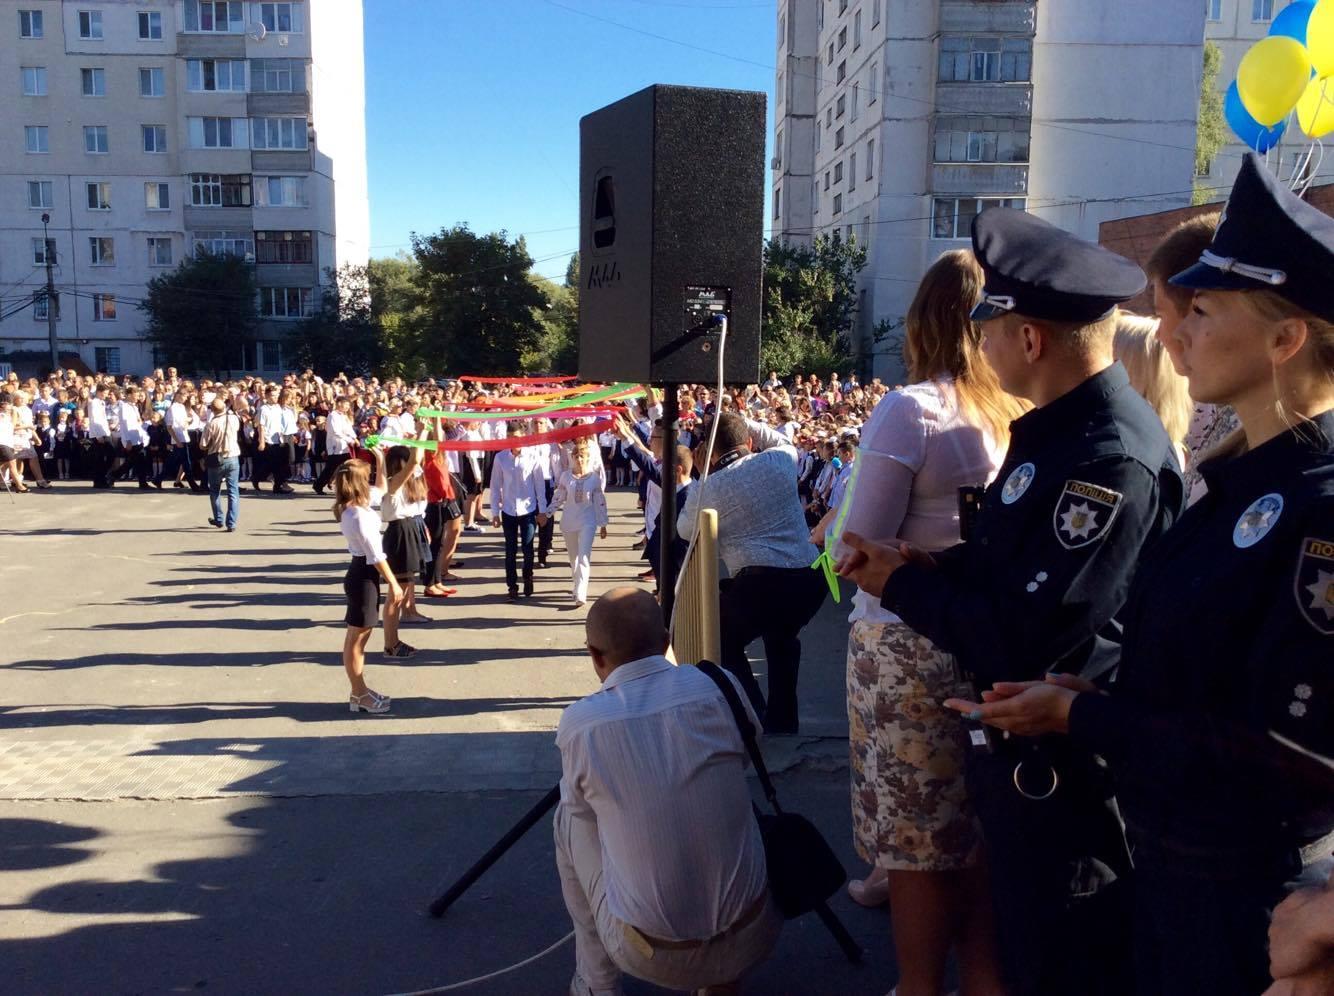 Хмельницький НВК№10 на Першовересень заполонили поліцейські - фото 2